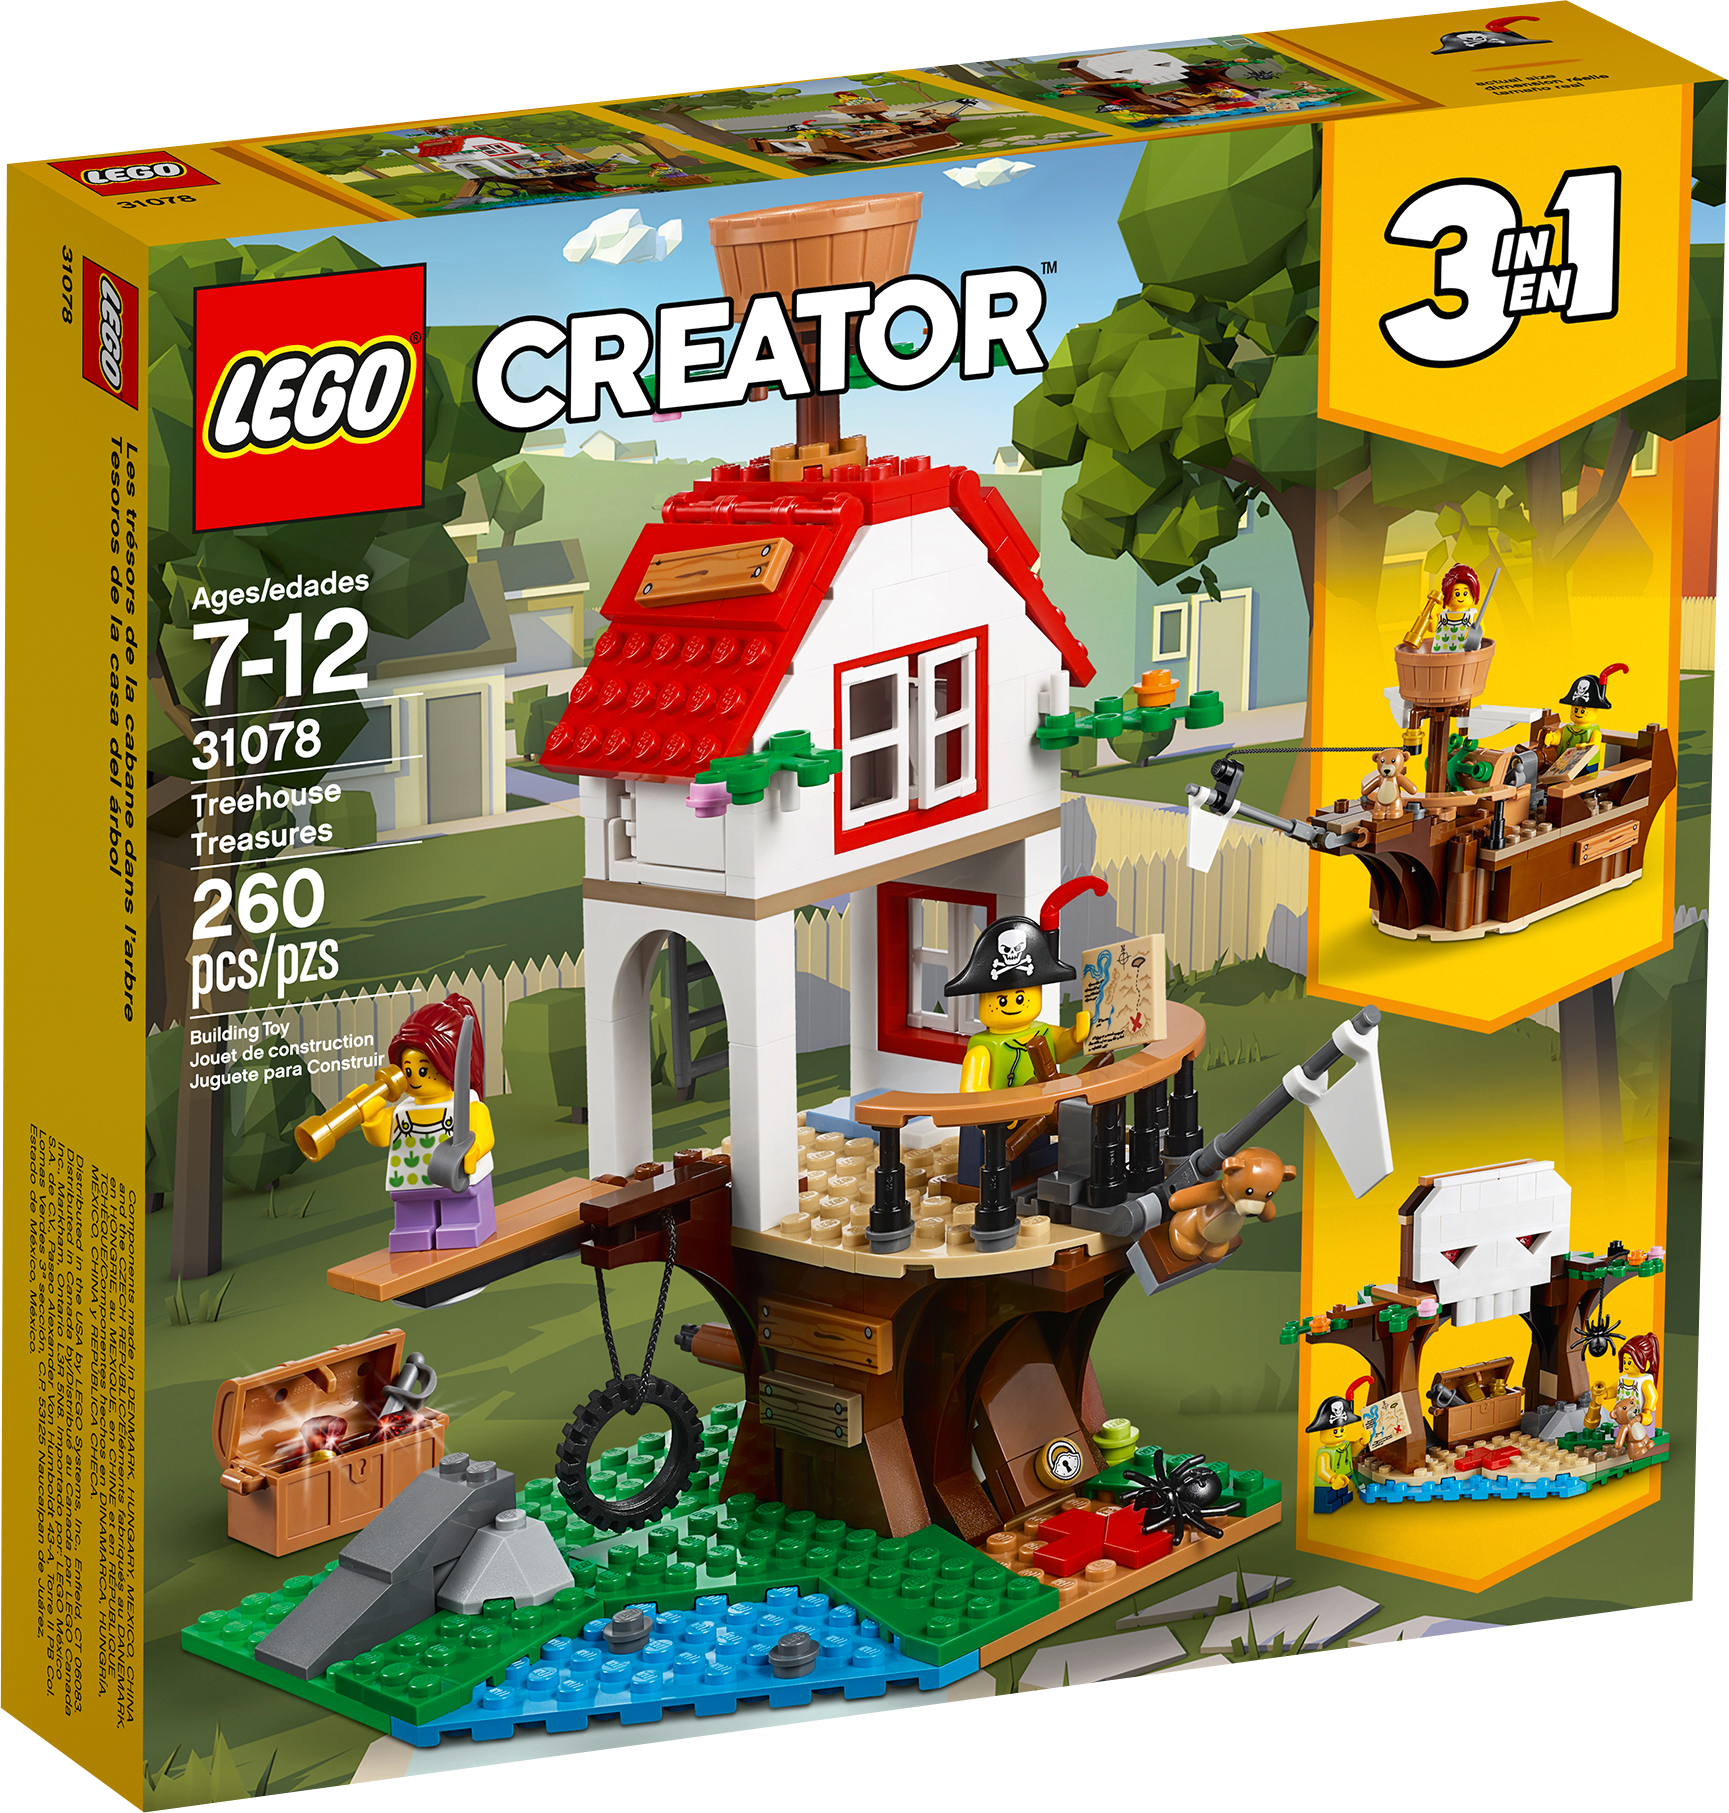 Treehouse Treasures